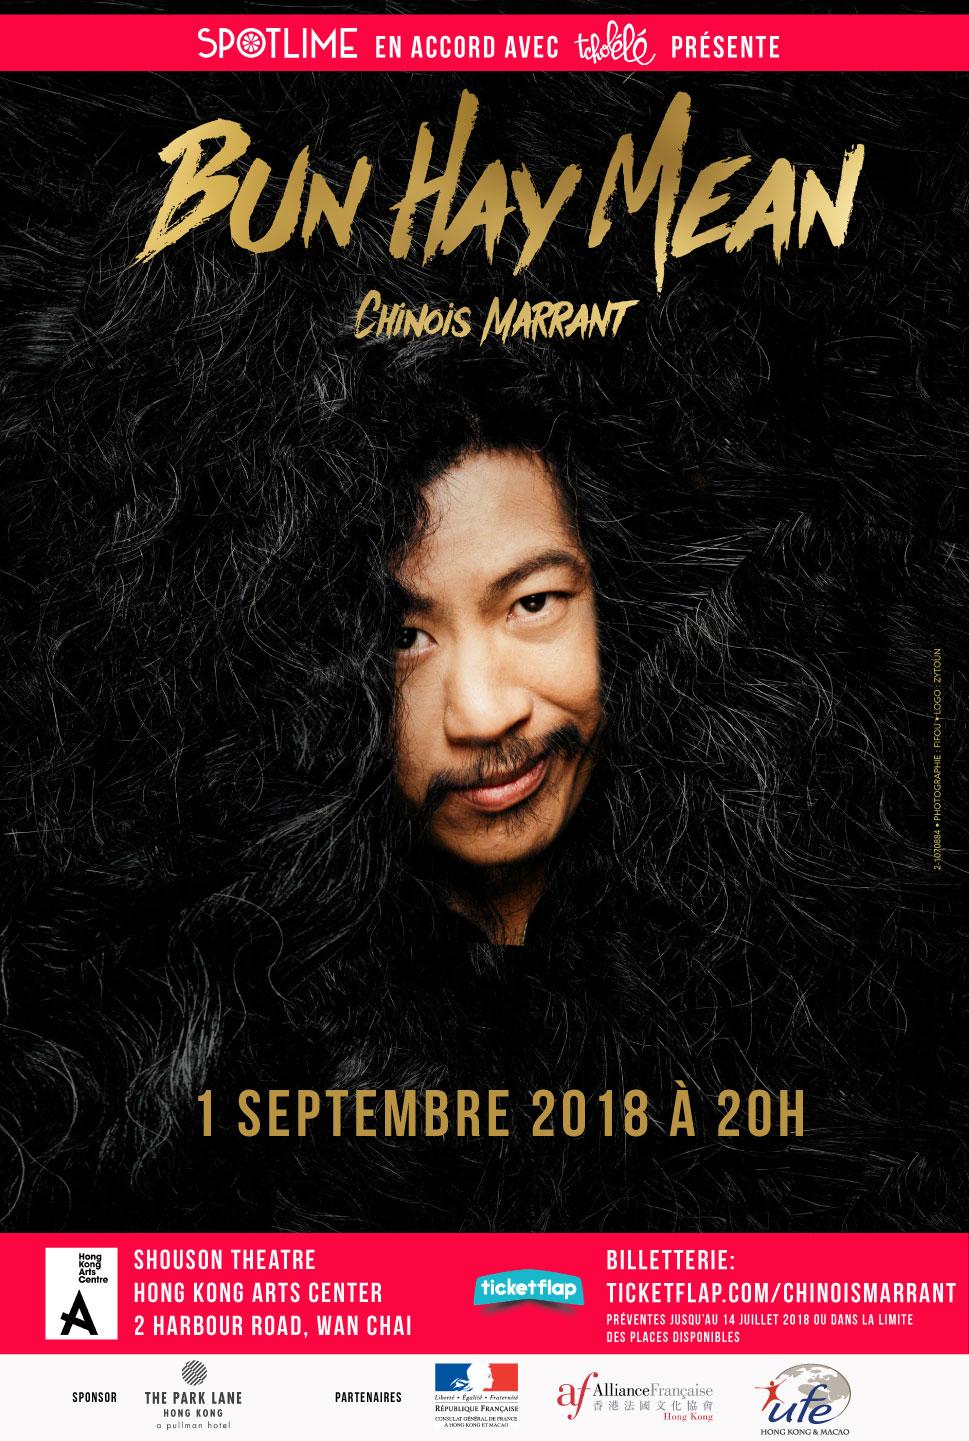 Bun Hay Mean en tournée à Shanghai, Bangkok, Hong Kong, et Singapour en septembre 2018